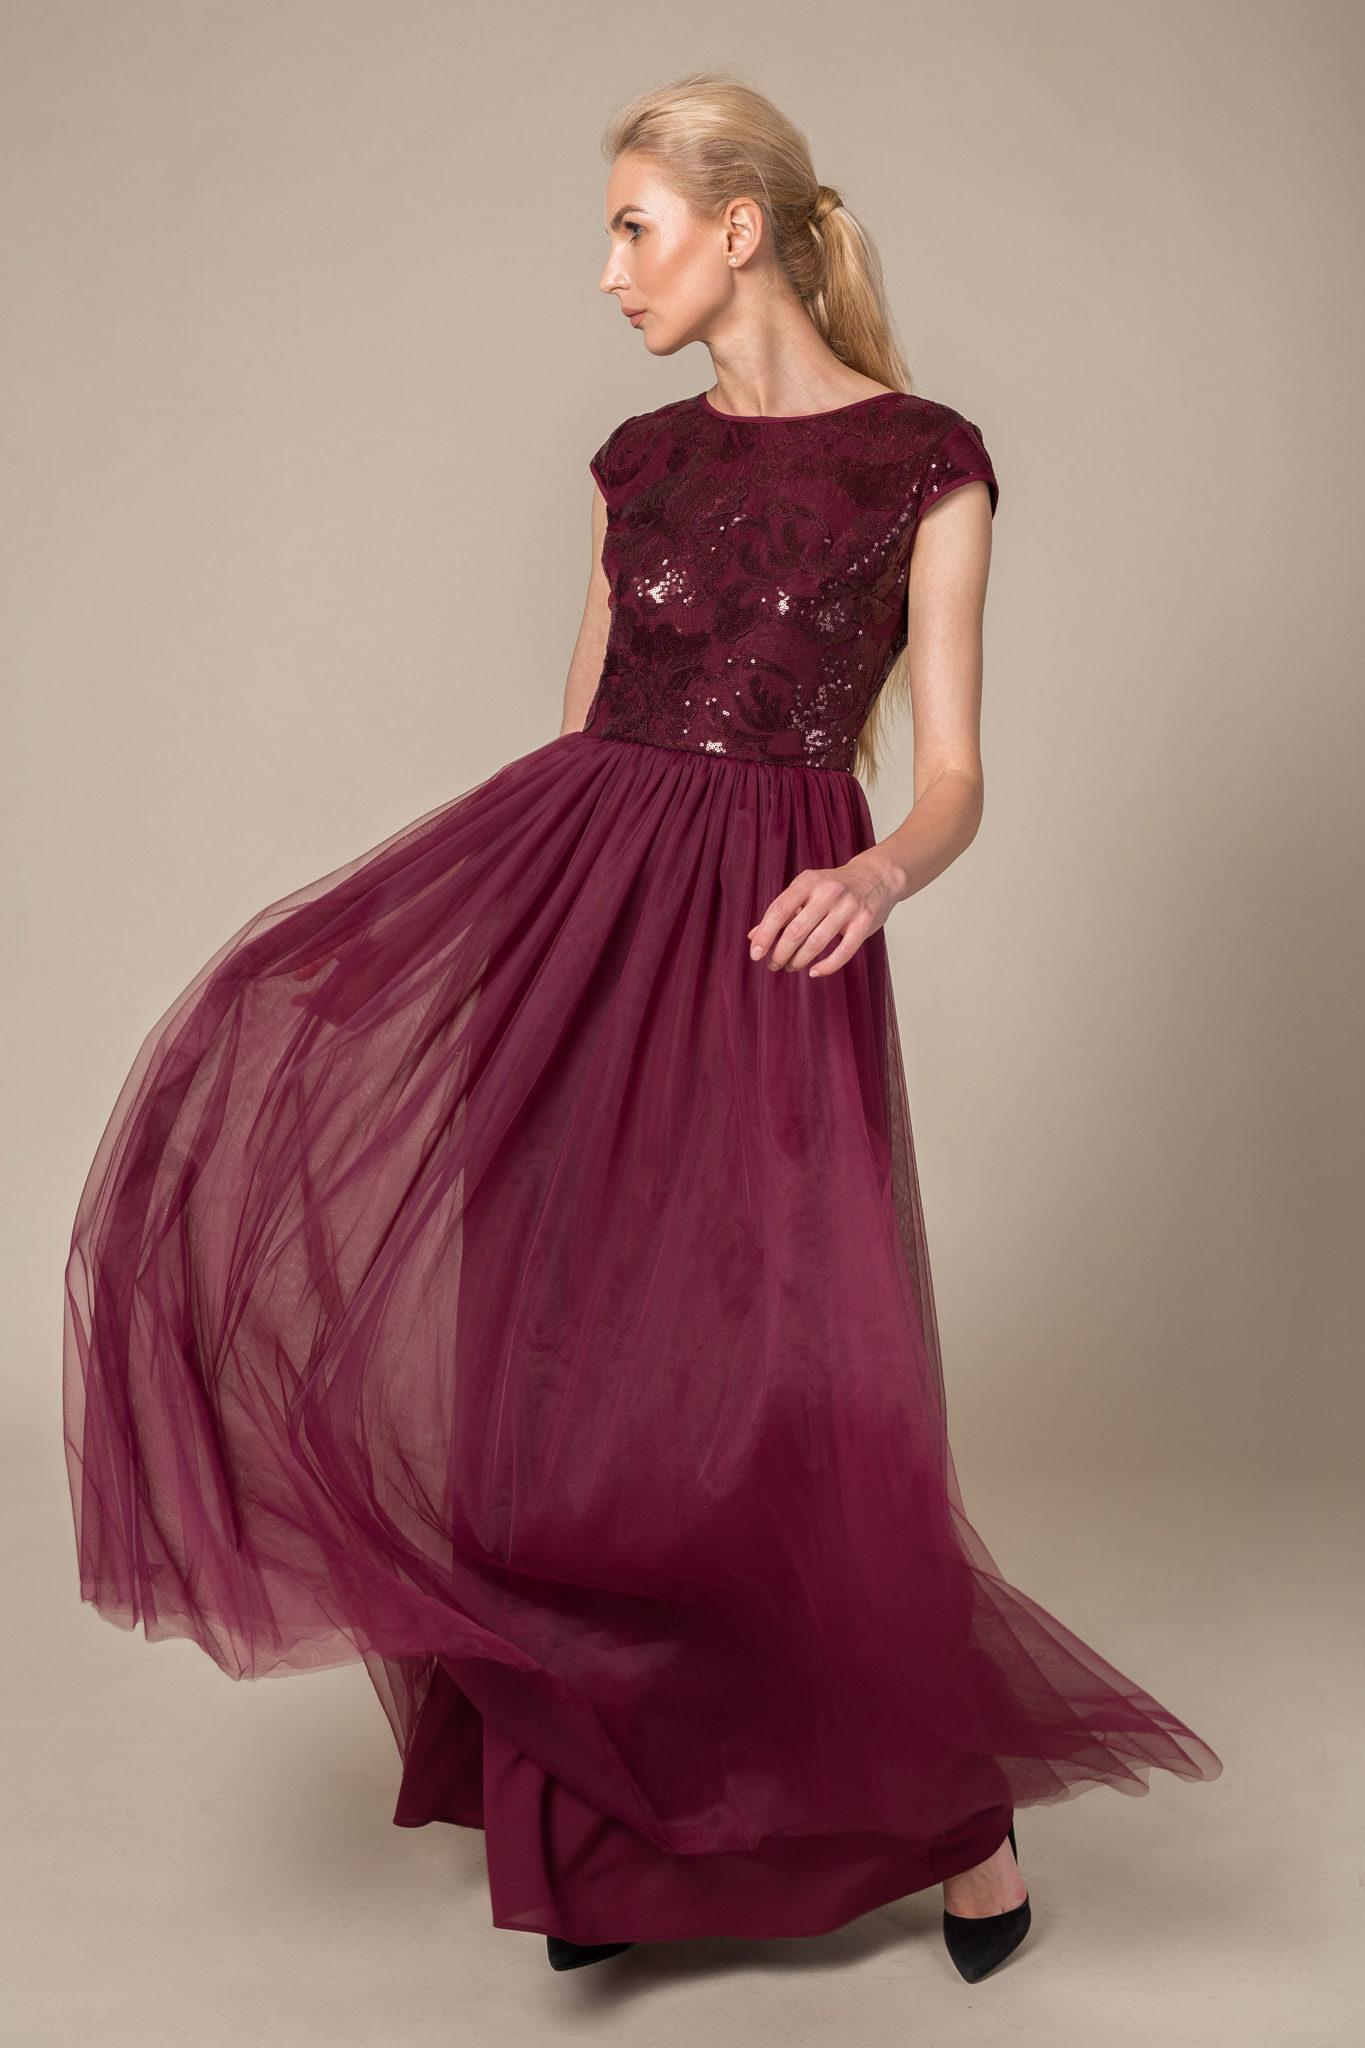 Jewel neck cap sleeved tulle bottom maxi dress